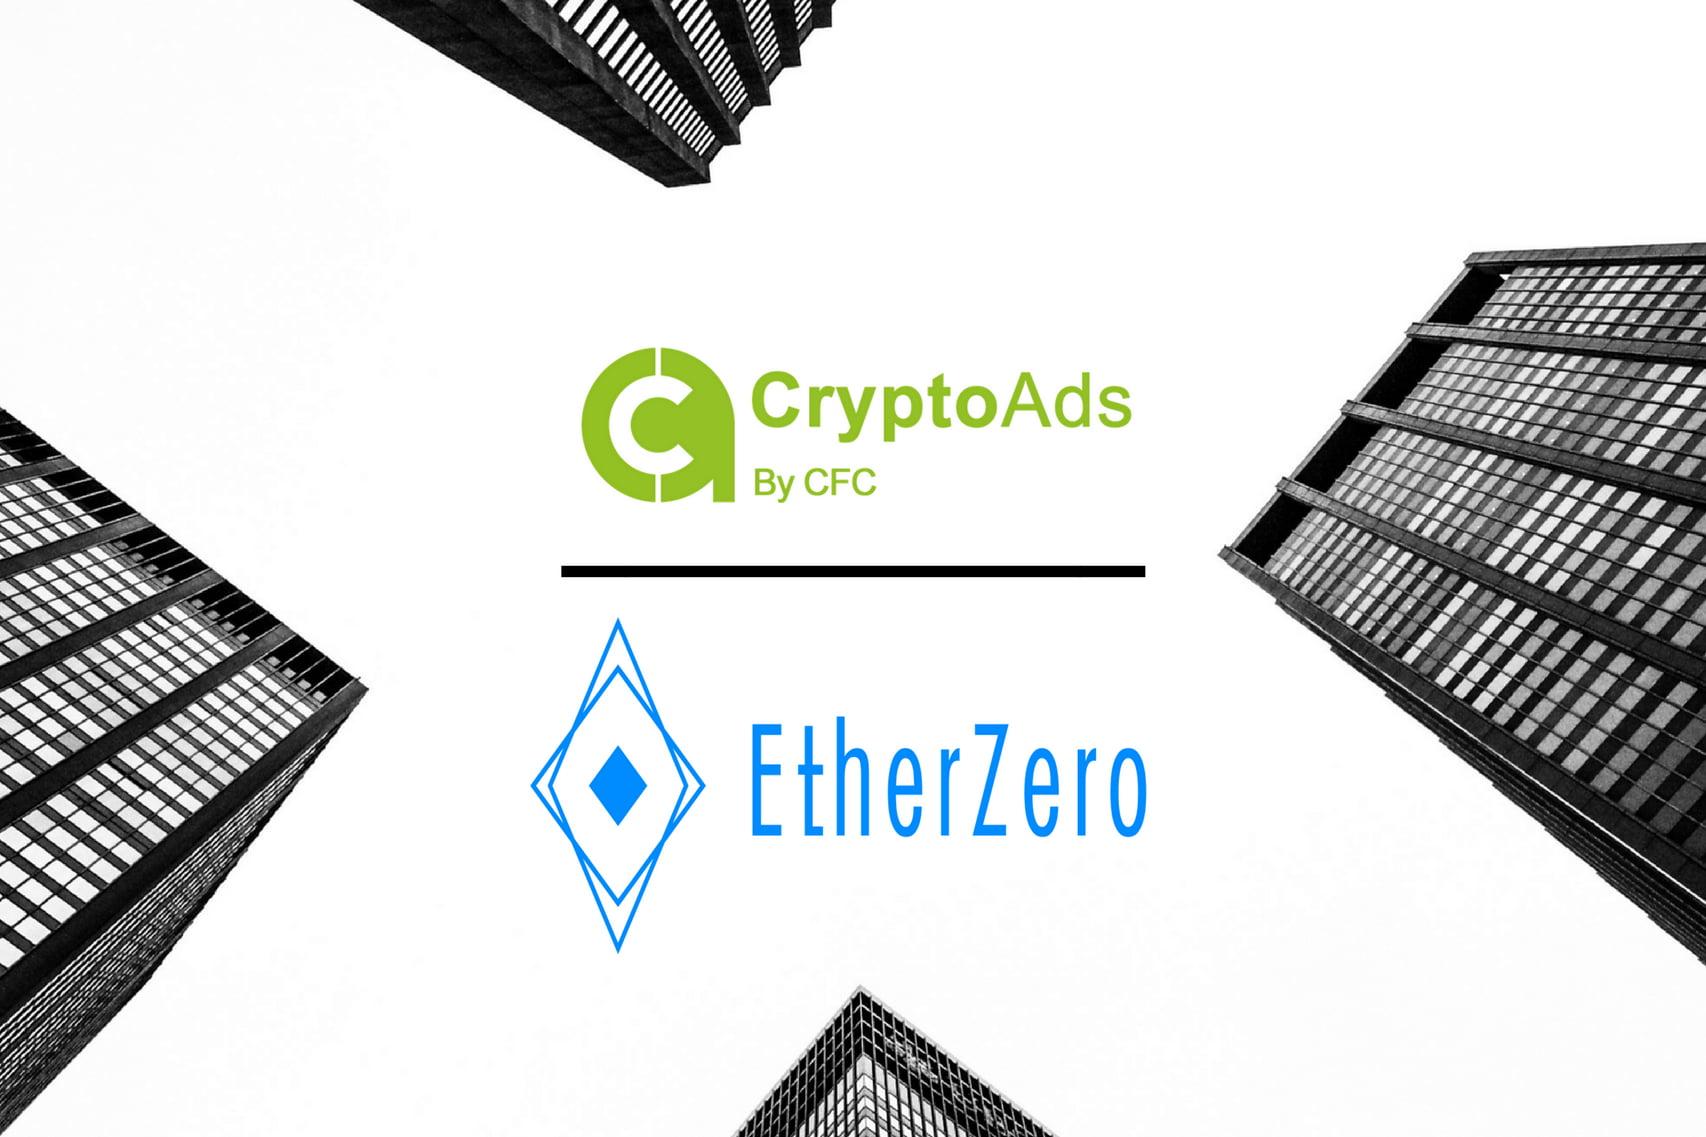 CryptoAds